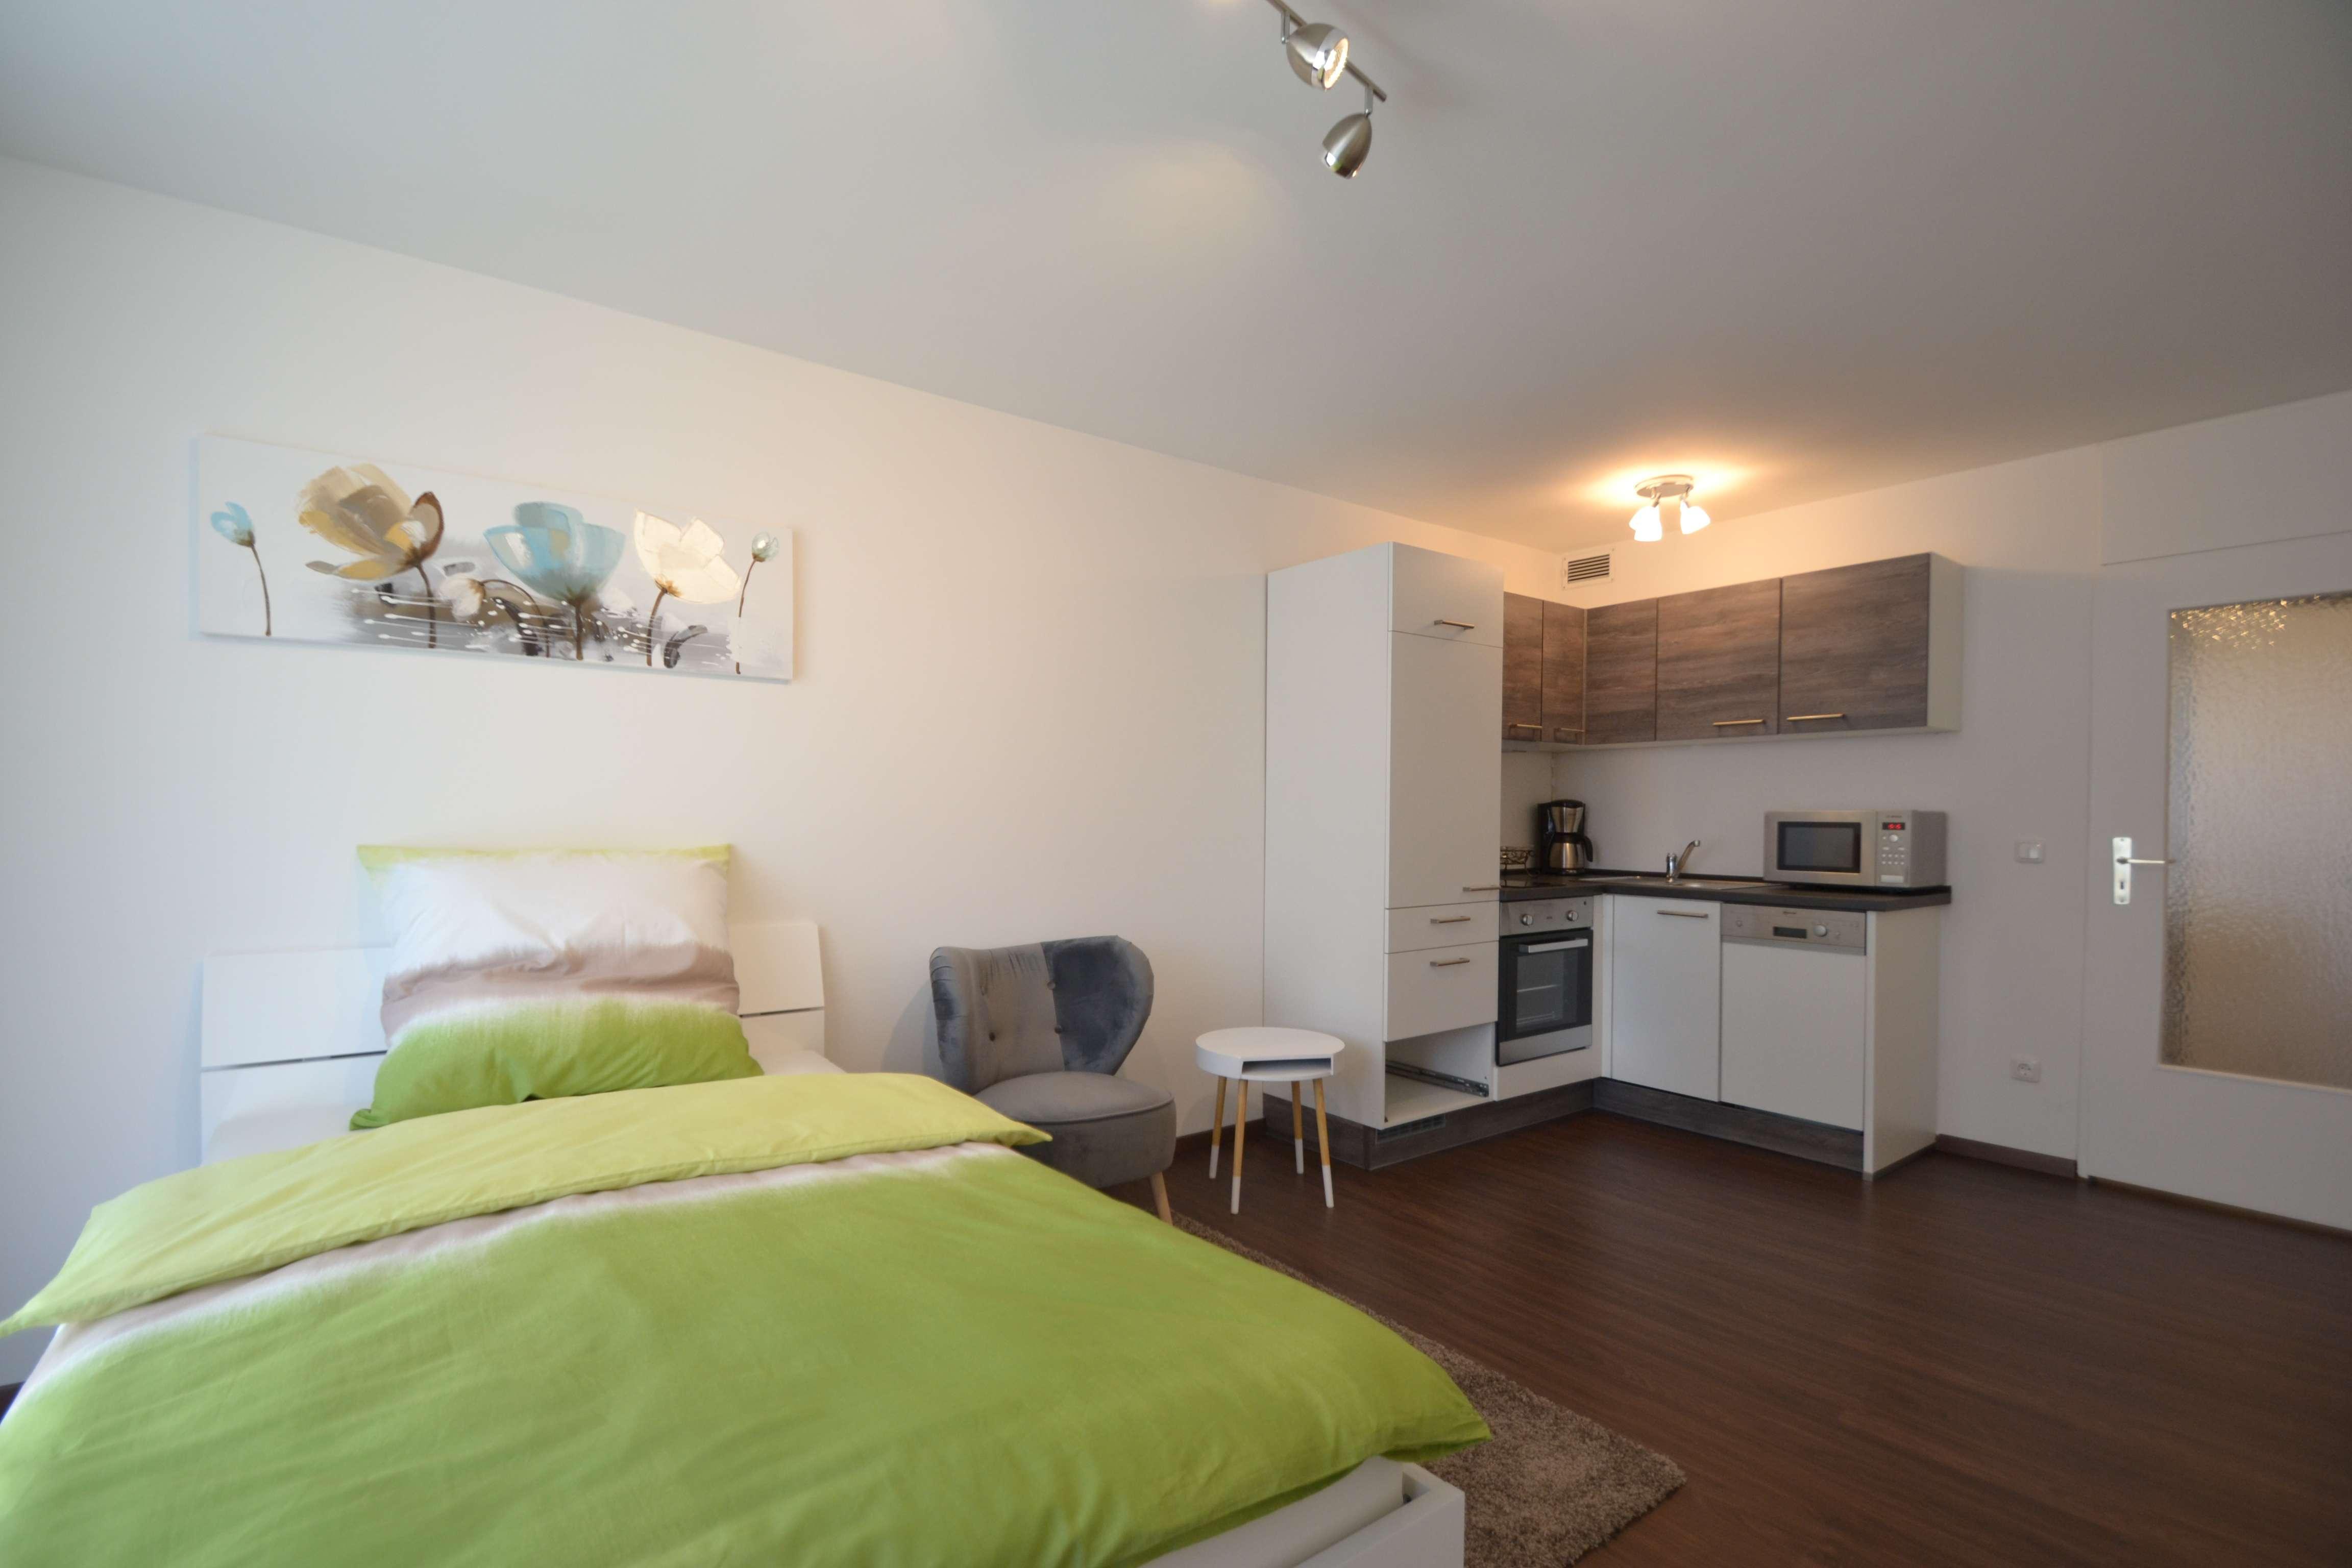 Modernes Apartment - Westbalkon - Vollausstattung - All Inklusive